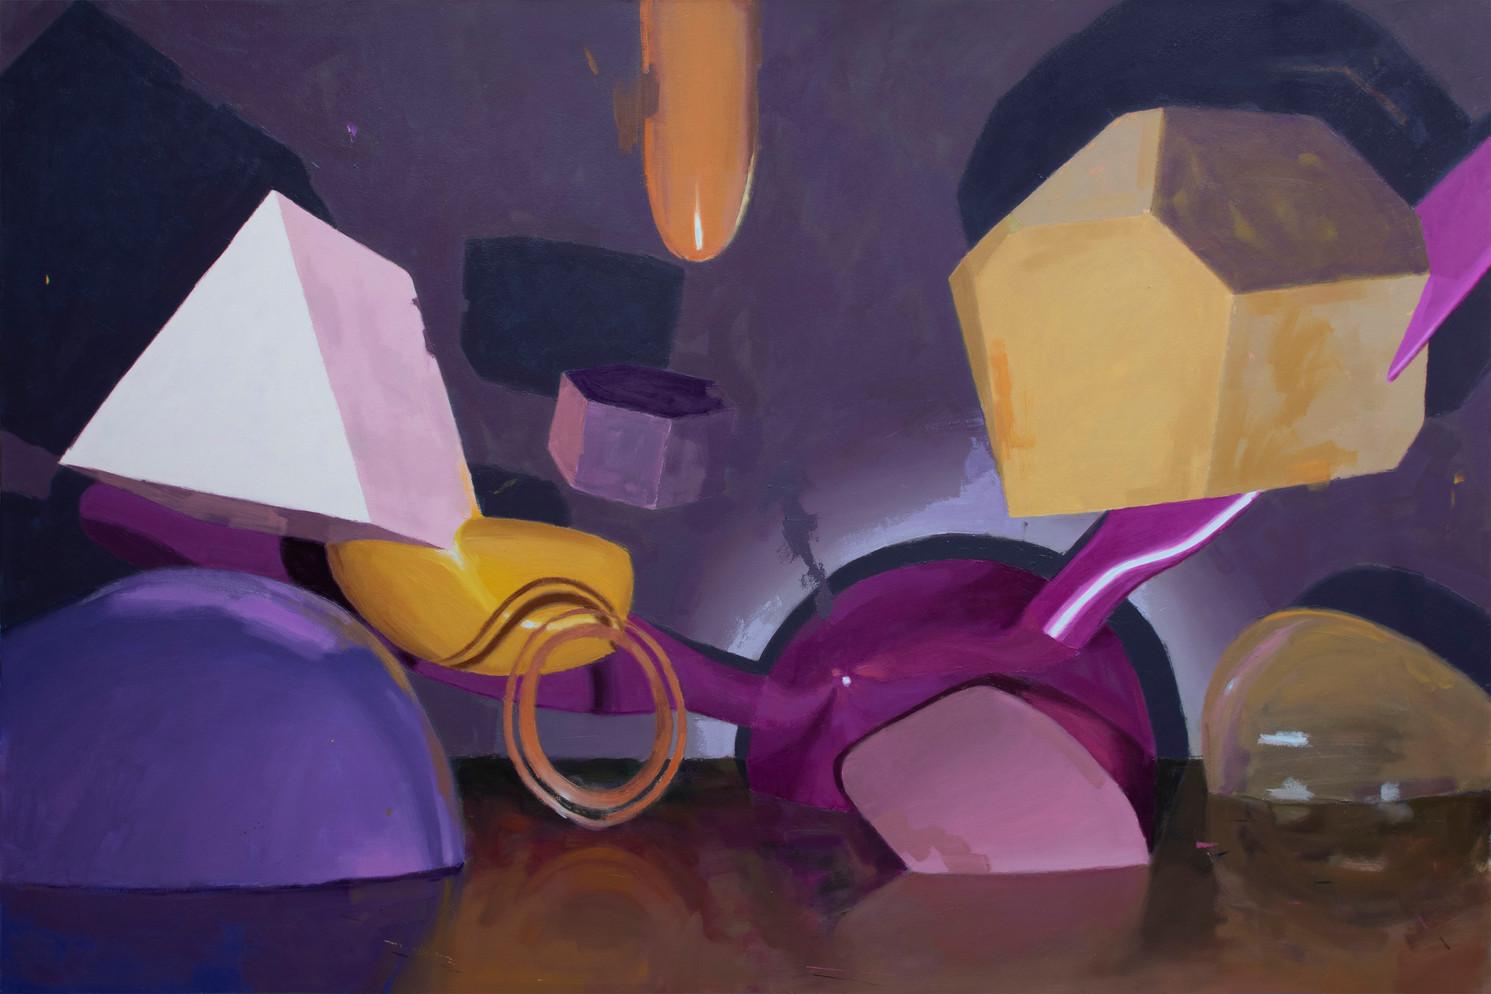 Hard Jelly, 2020, oil on canvas, 120 x 180 cm